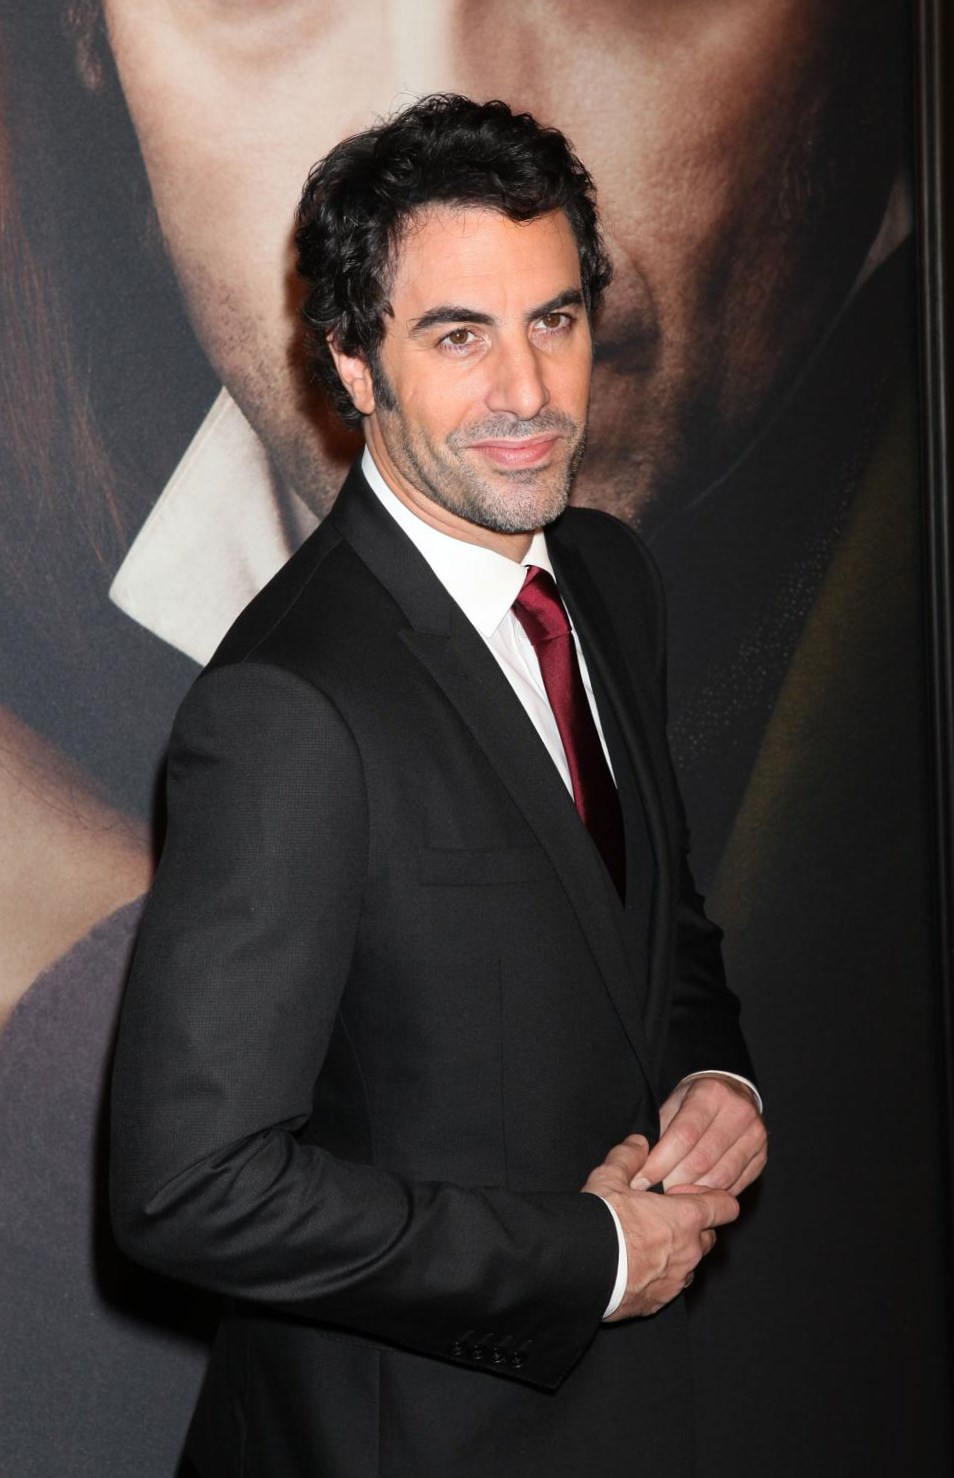 Sacha Noam Baron Cohen Net Worth - Salary, House, Car Sacha Baron Cohen Net Worth